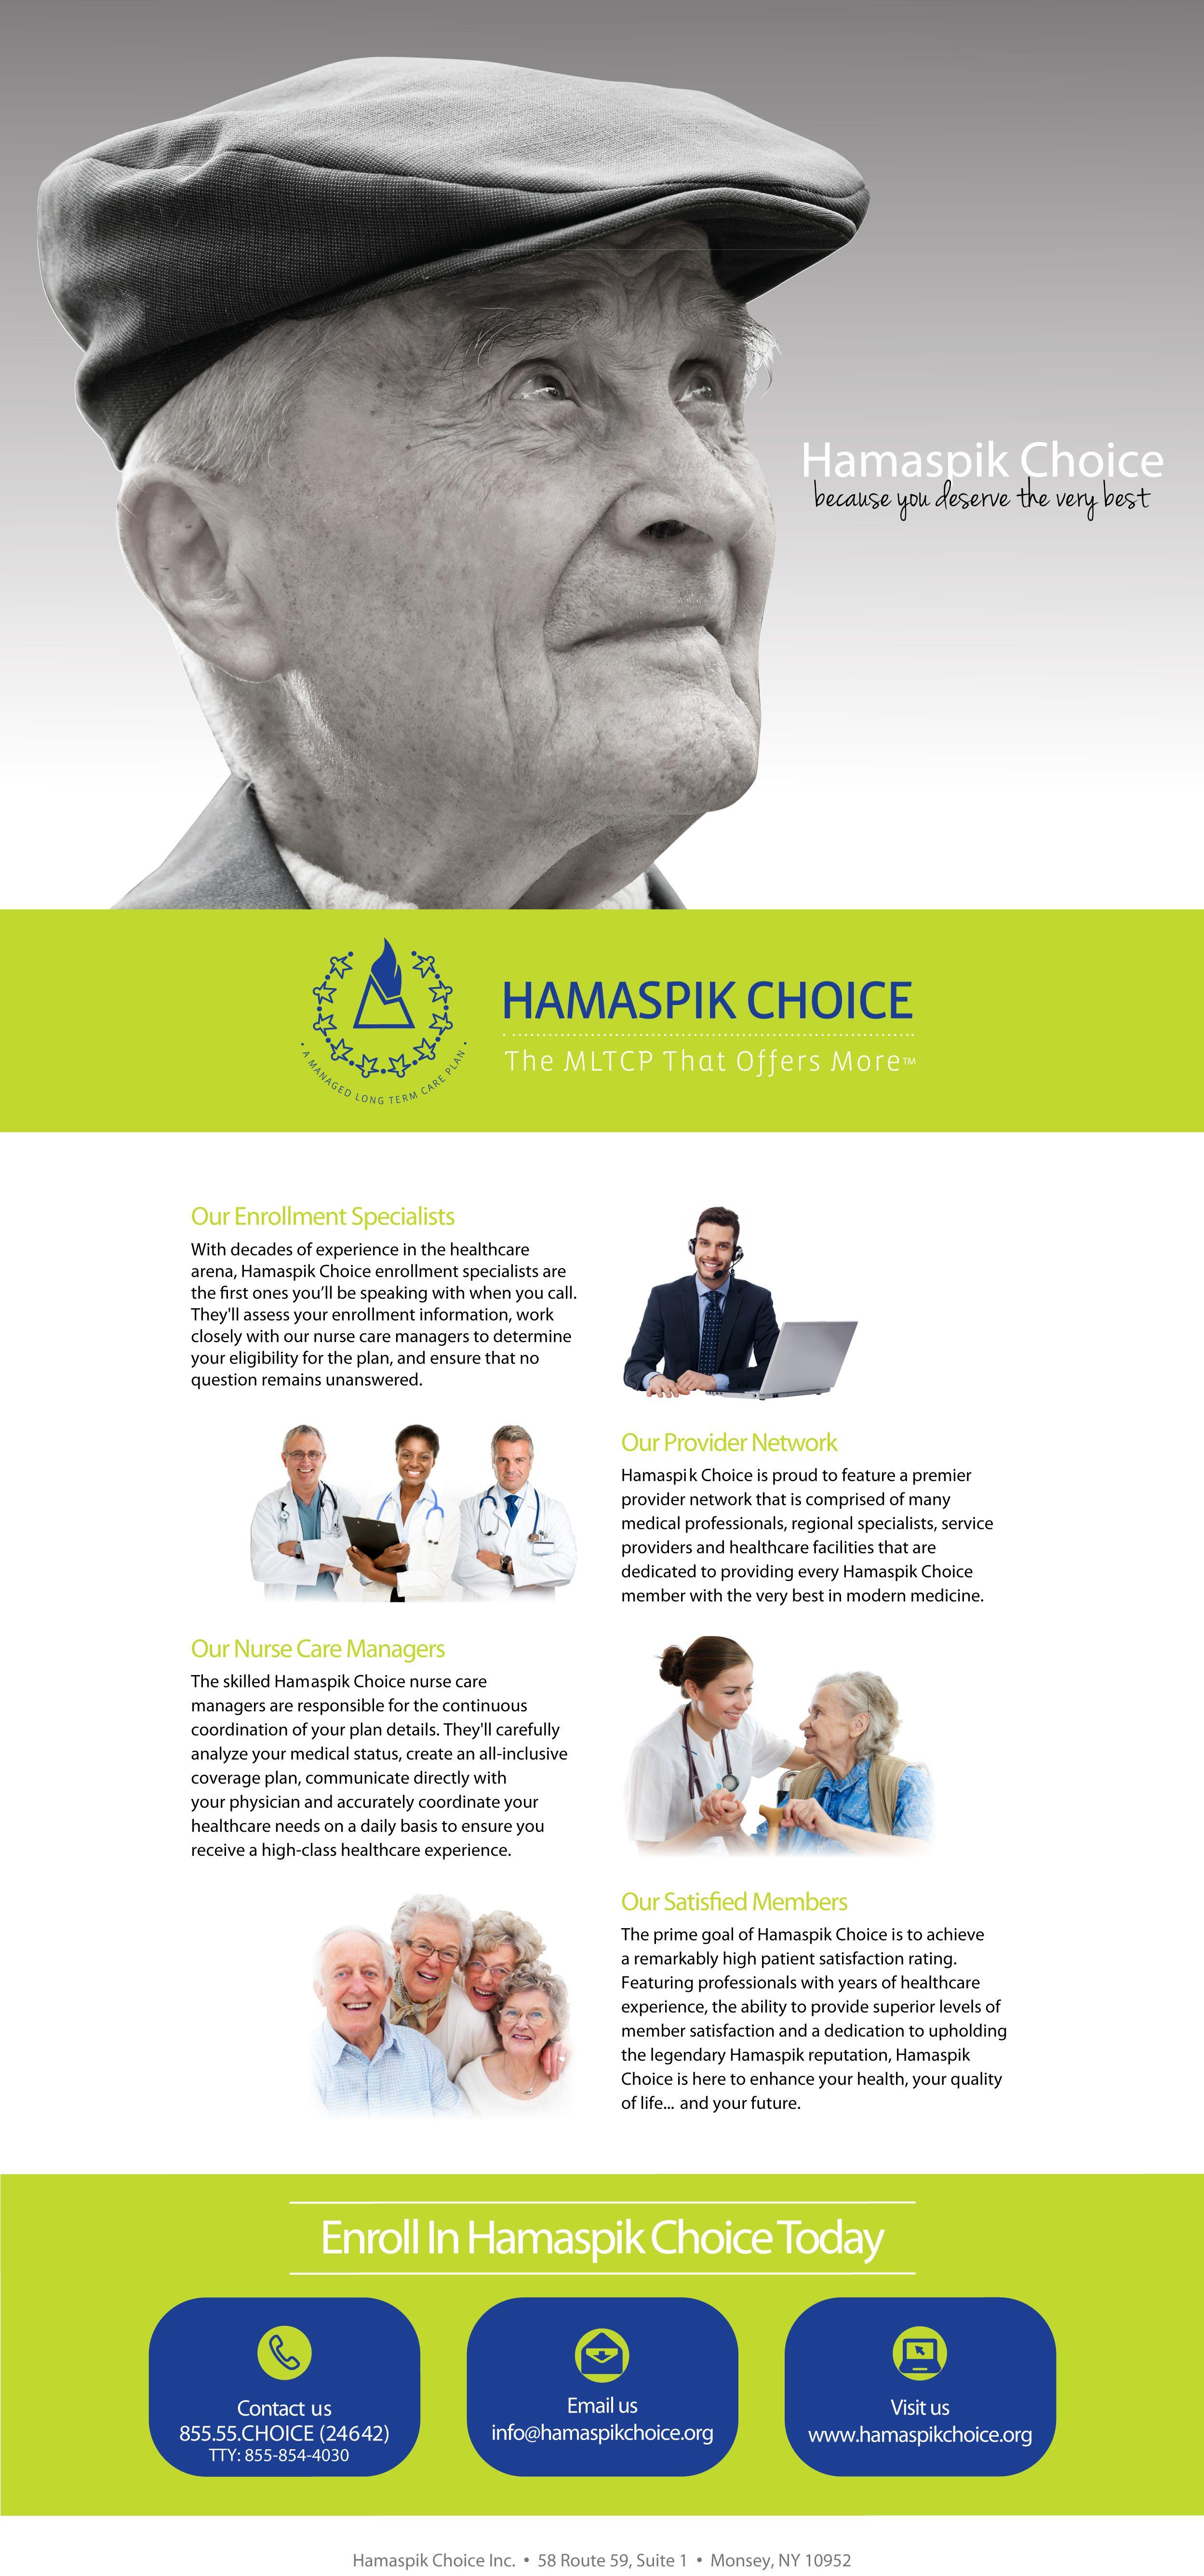 Hamaspic